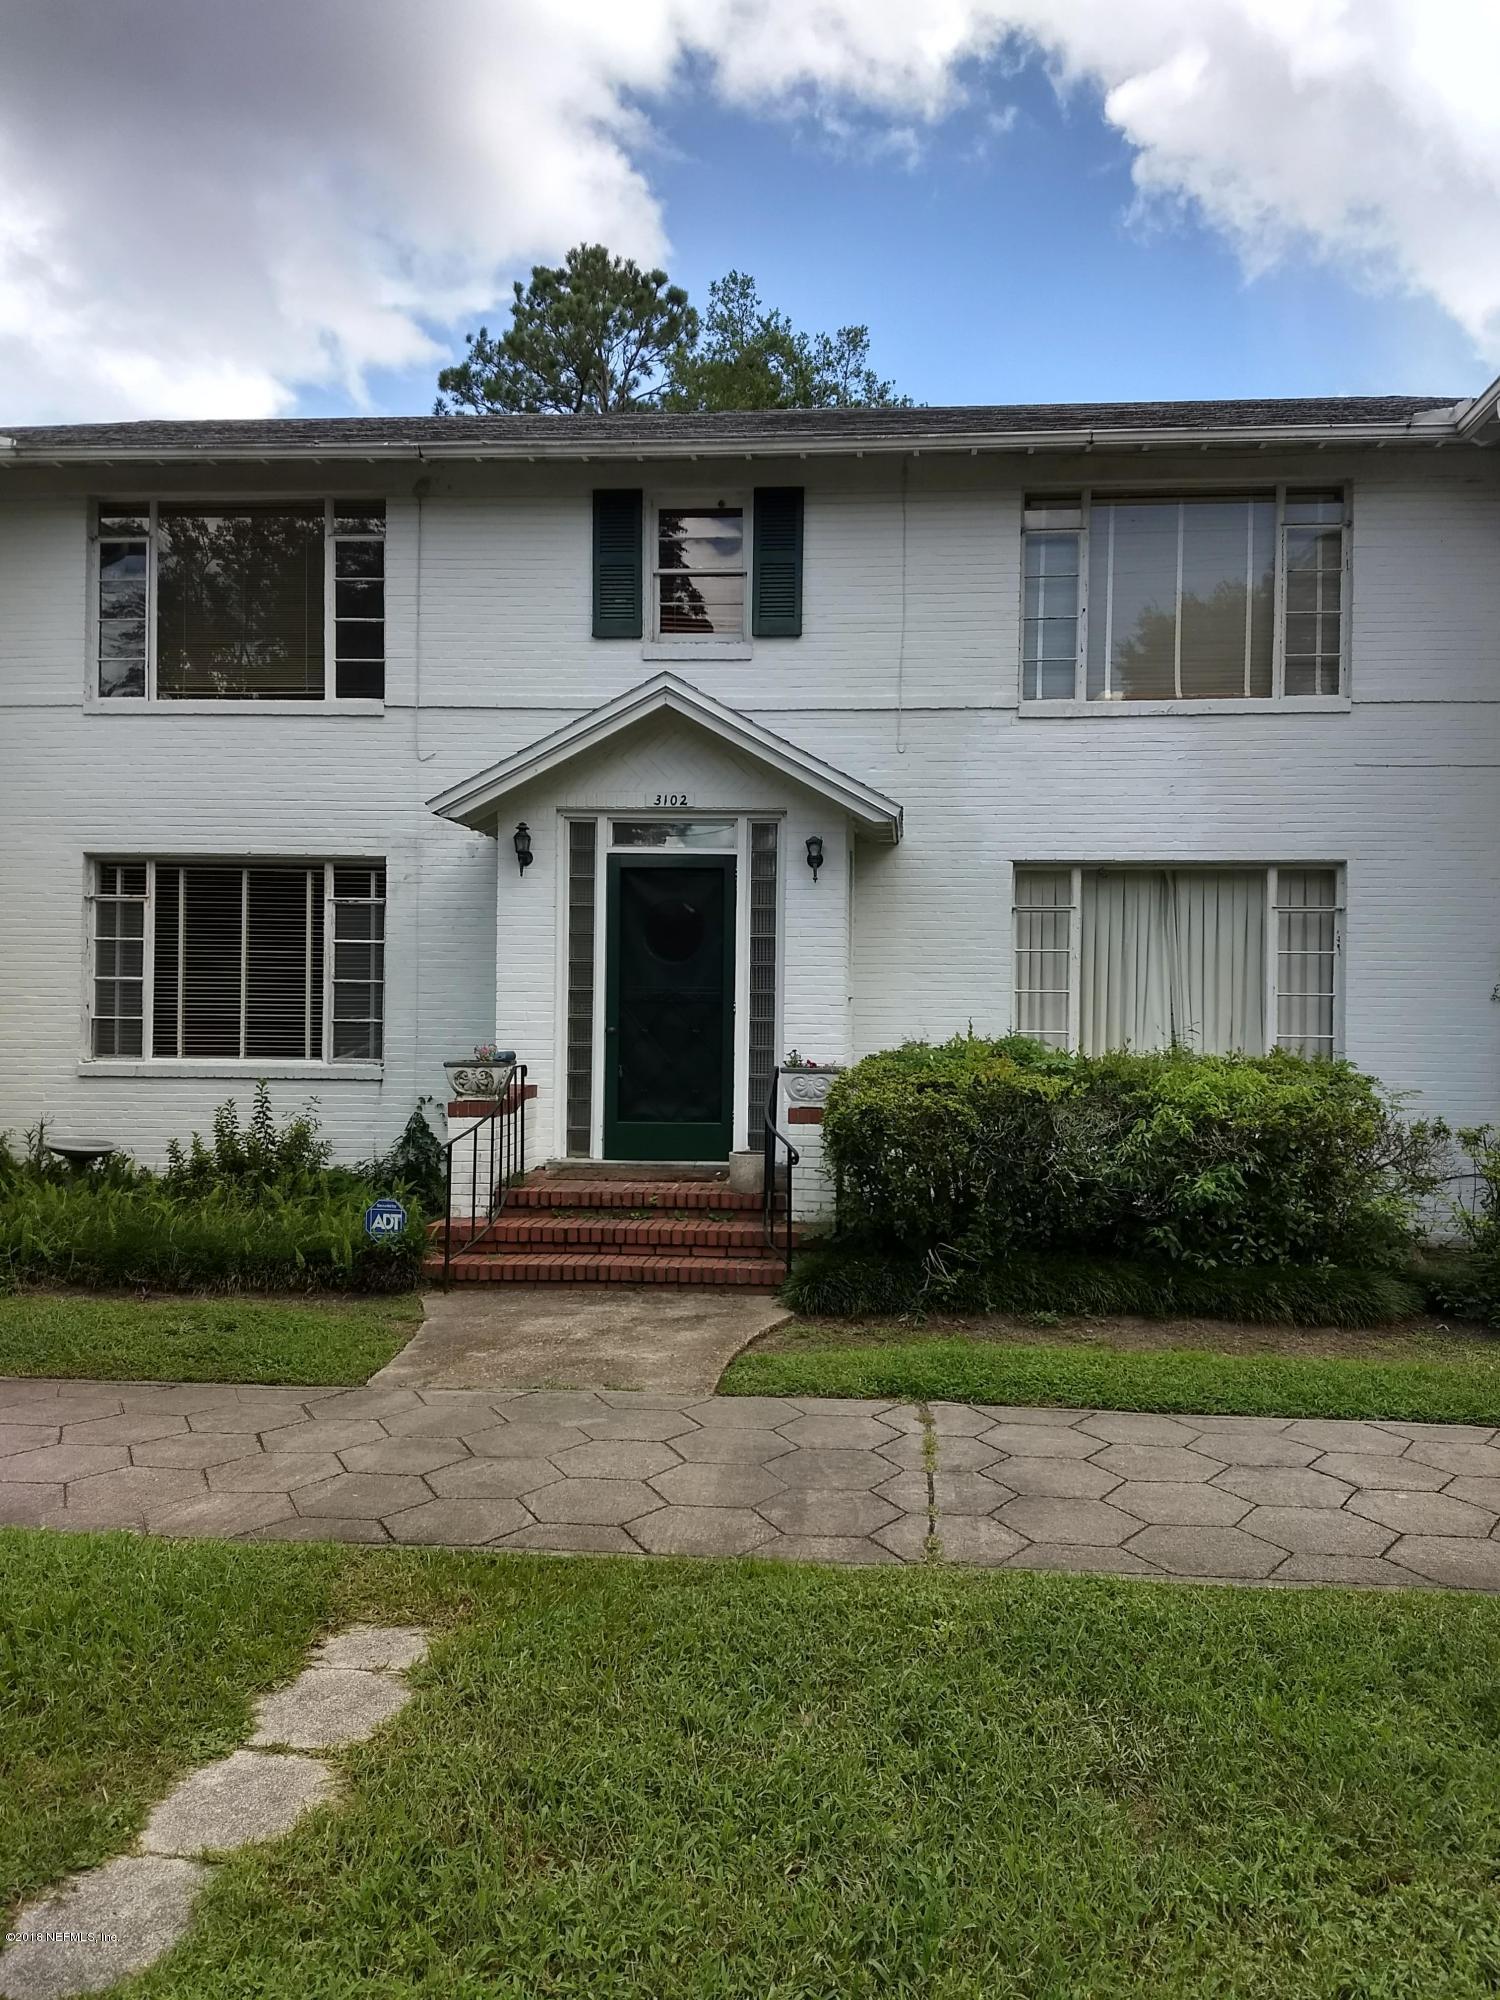 3102 RIVERSIDE, JACKSONVILLE, FLORIDA 32205, 2 Bedrooms Bedrooms, ,1 BathroomBathrooms,Rental,For Rent,RIVERSIDE,956113